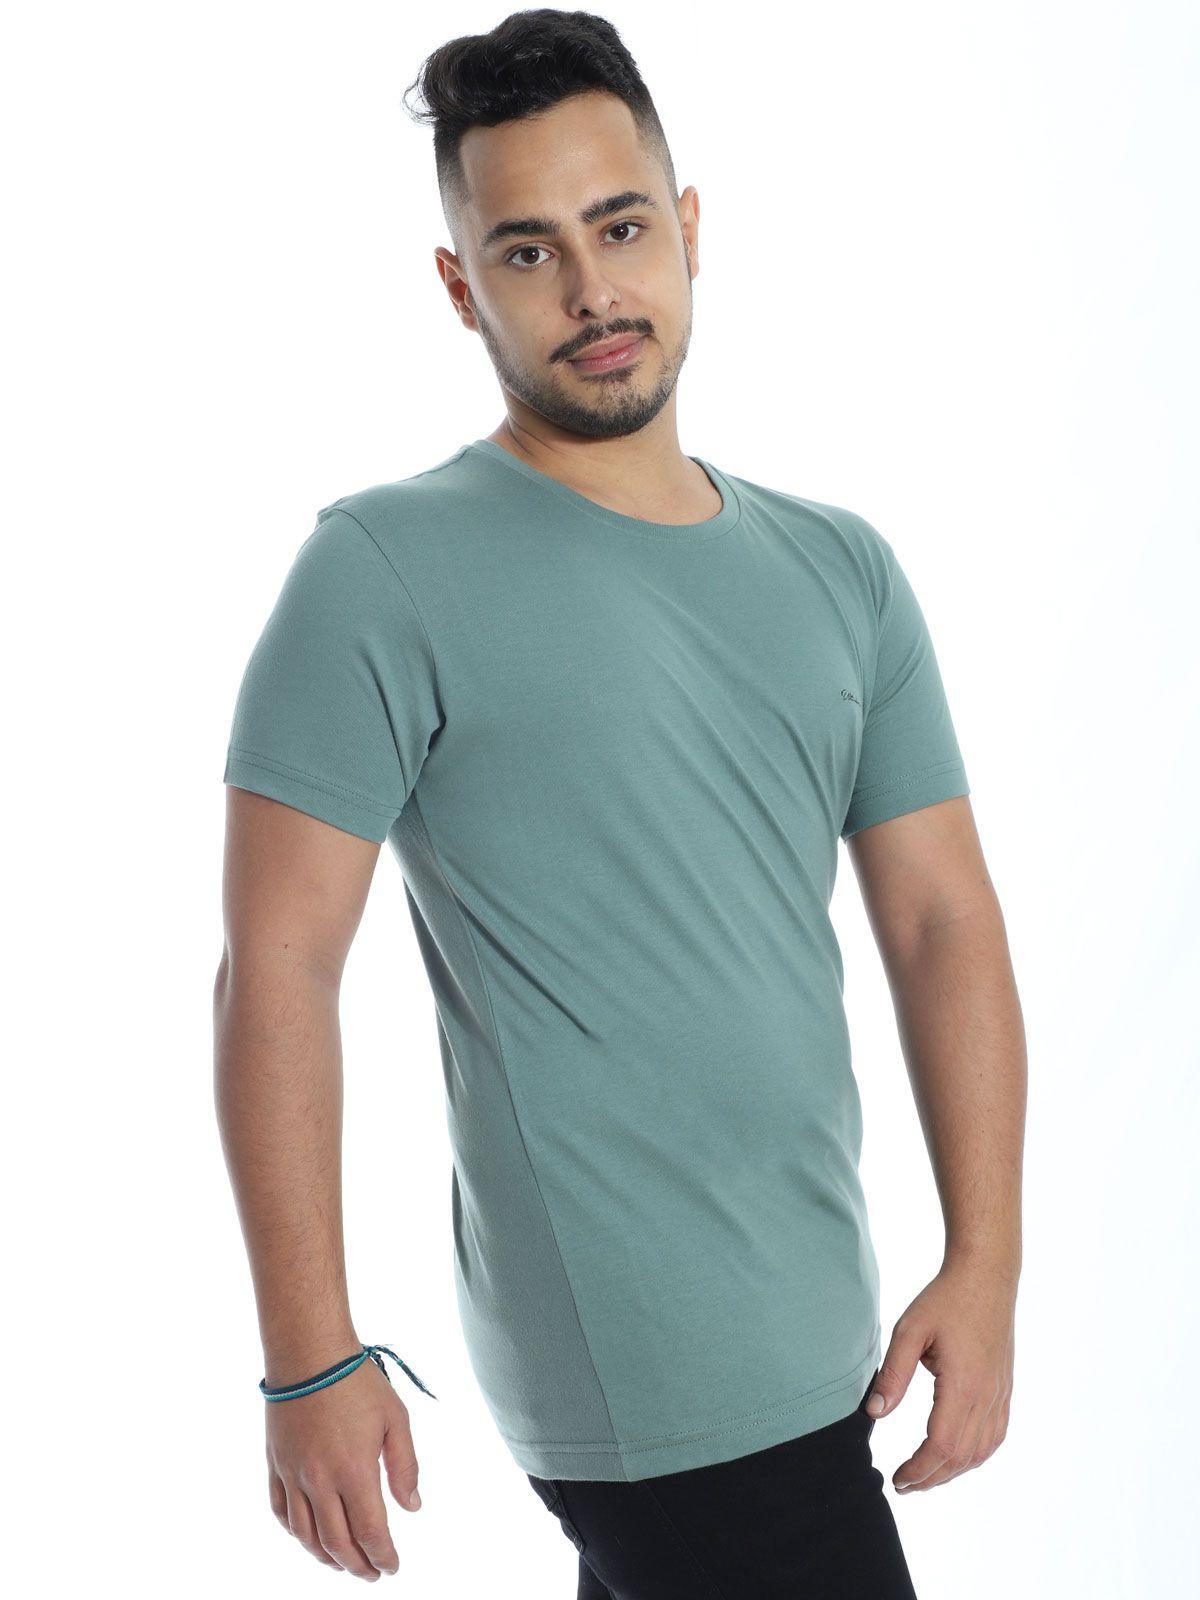 Camiseta Anistia Slim Fit Ultrabrand Concreto